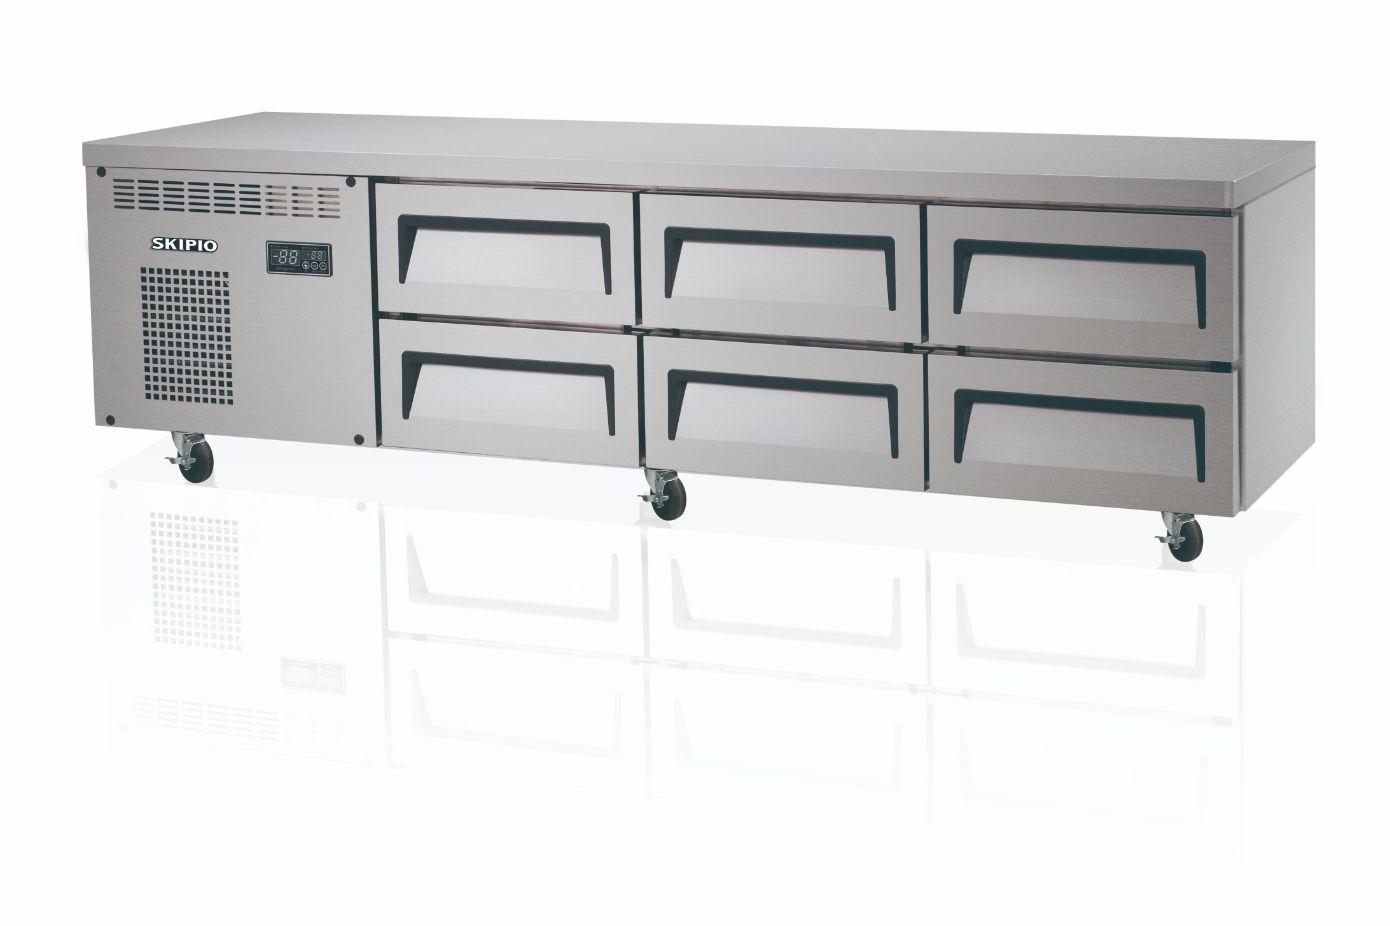 Skipio SCB18-6 Chef Base Refrigerator